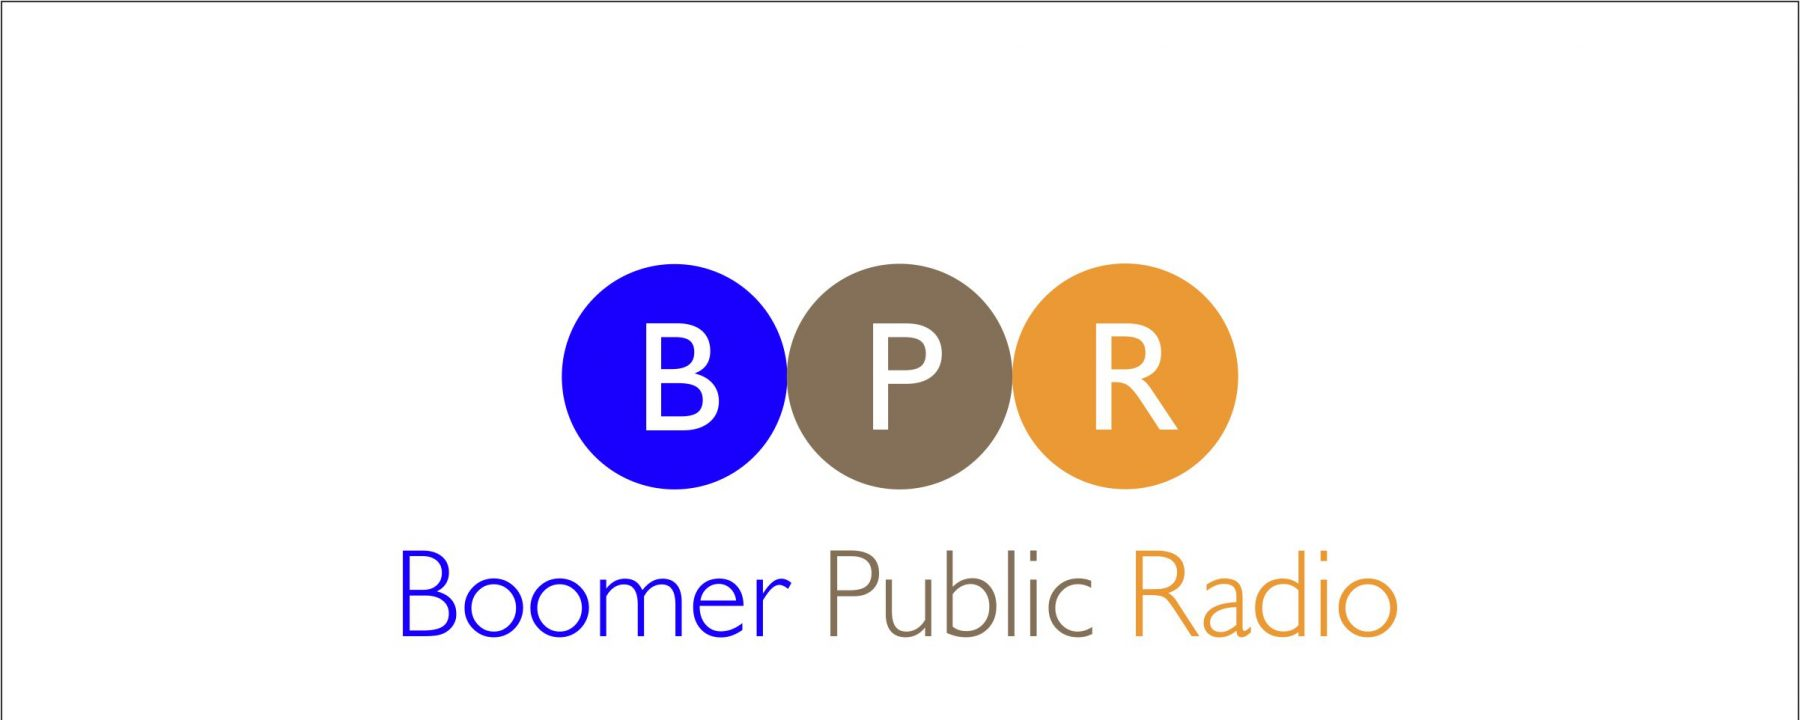 cropped-bpr-facebook-bannerblack-background.jpg